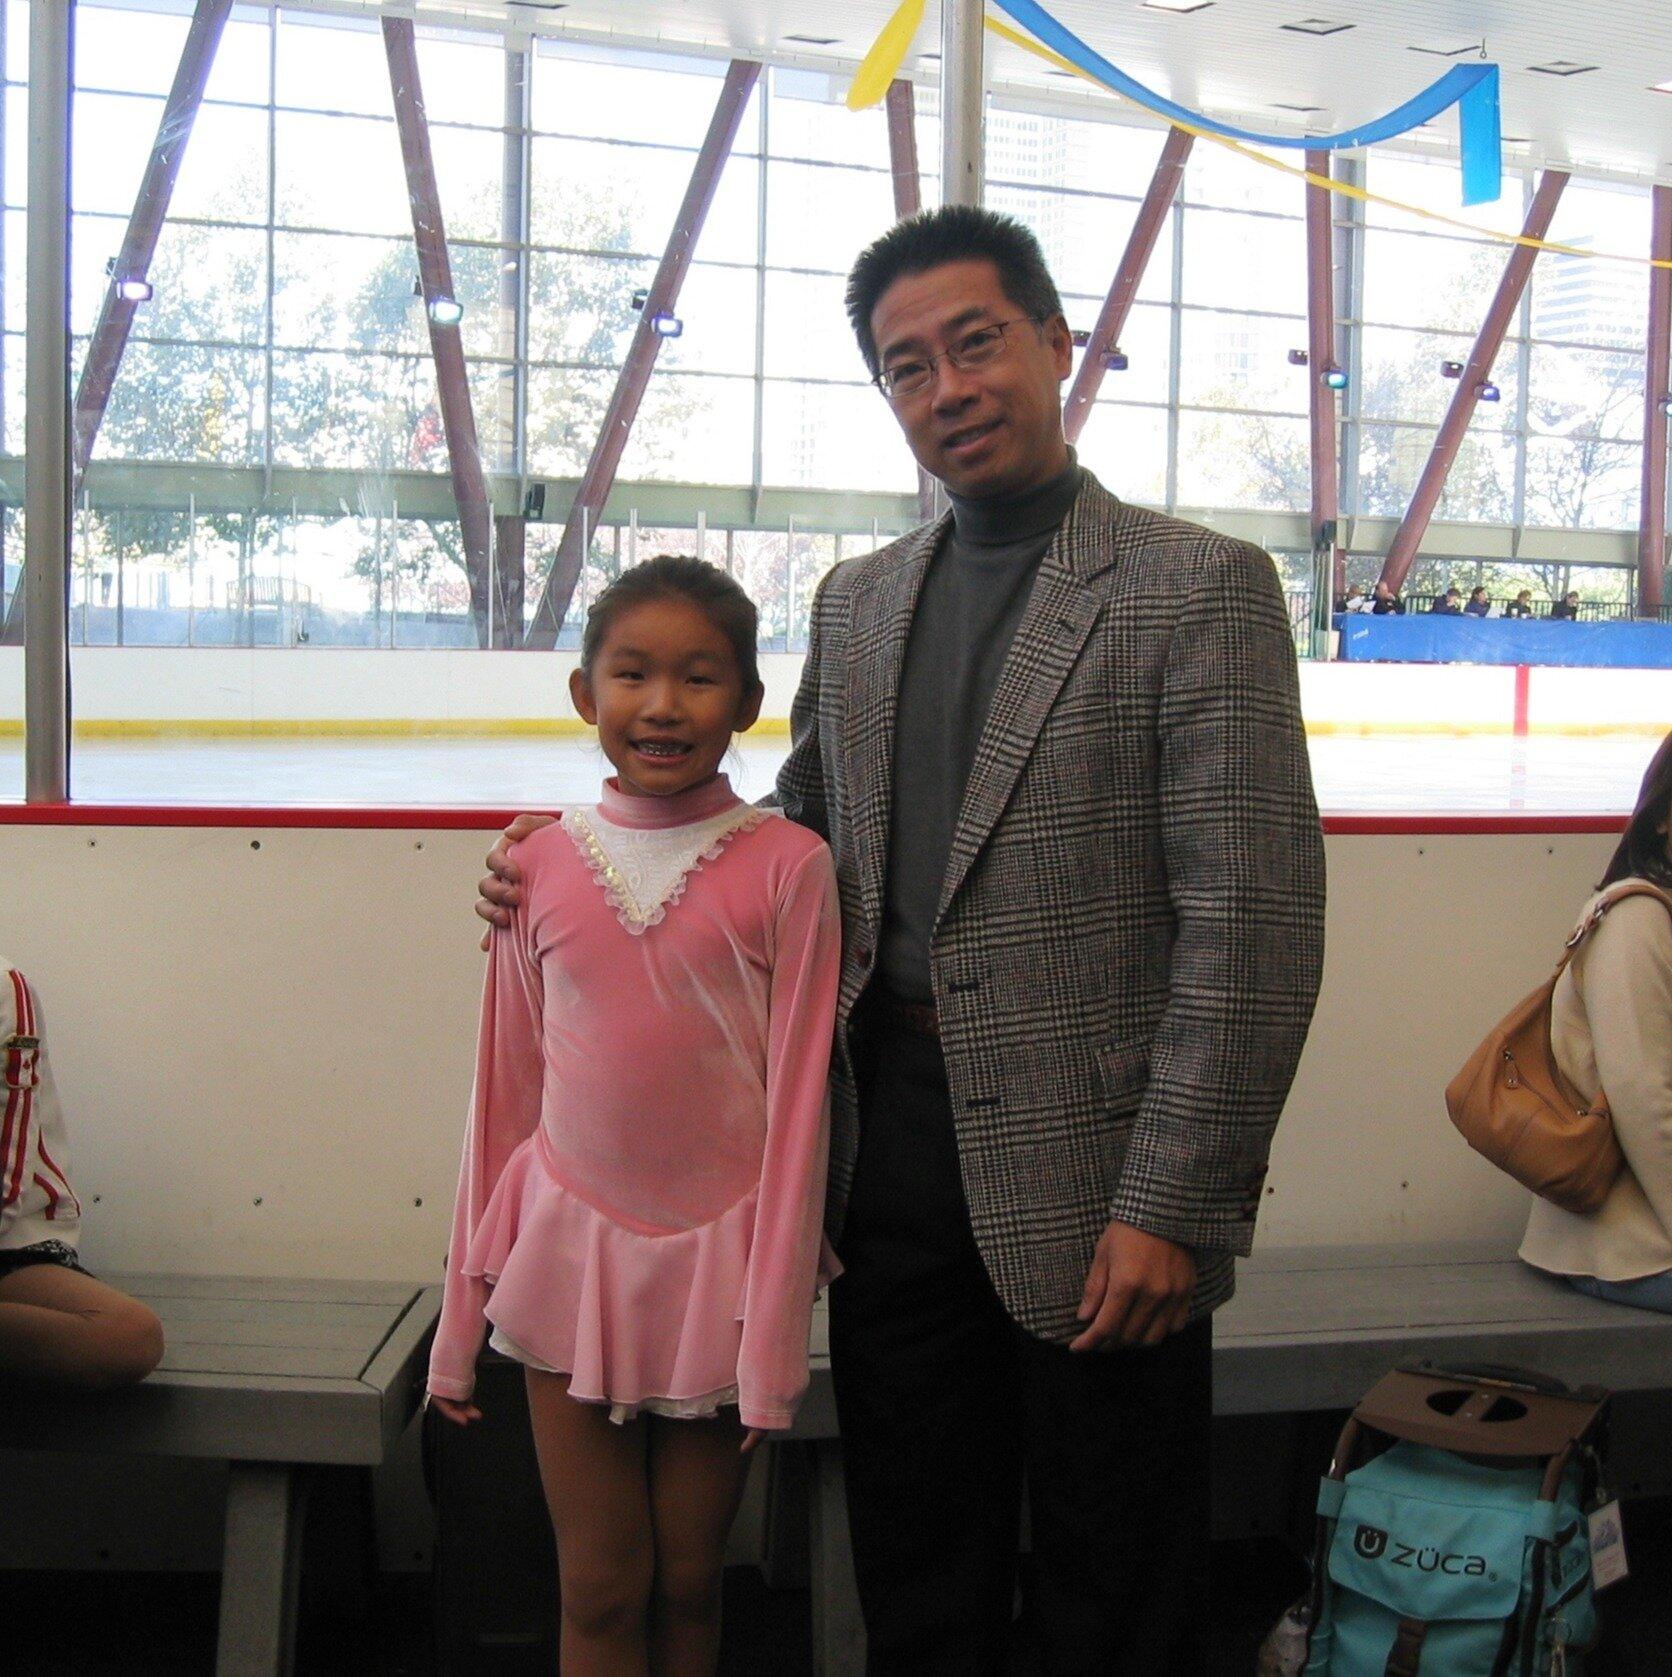 skating-picture-6.jpg